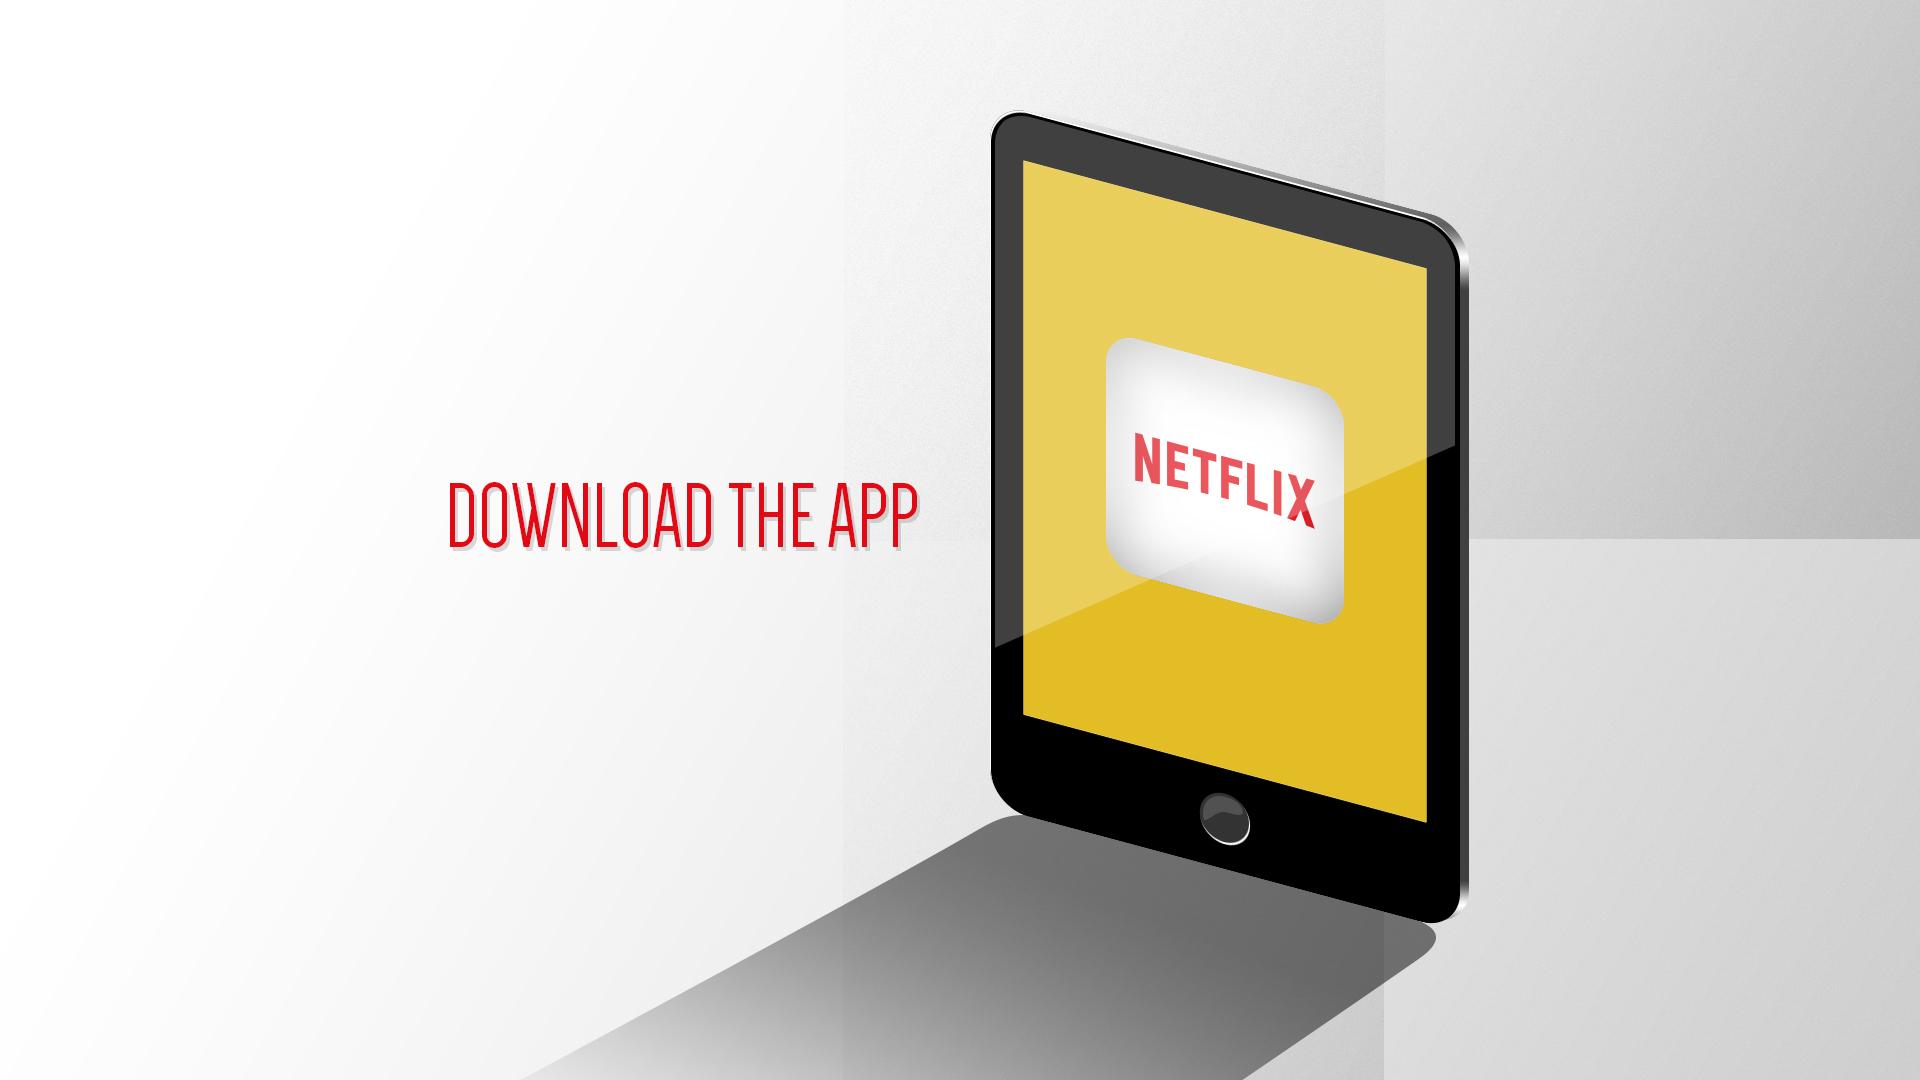 Netflix_HowTo_04_alt.jpg